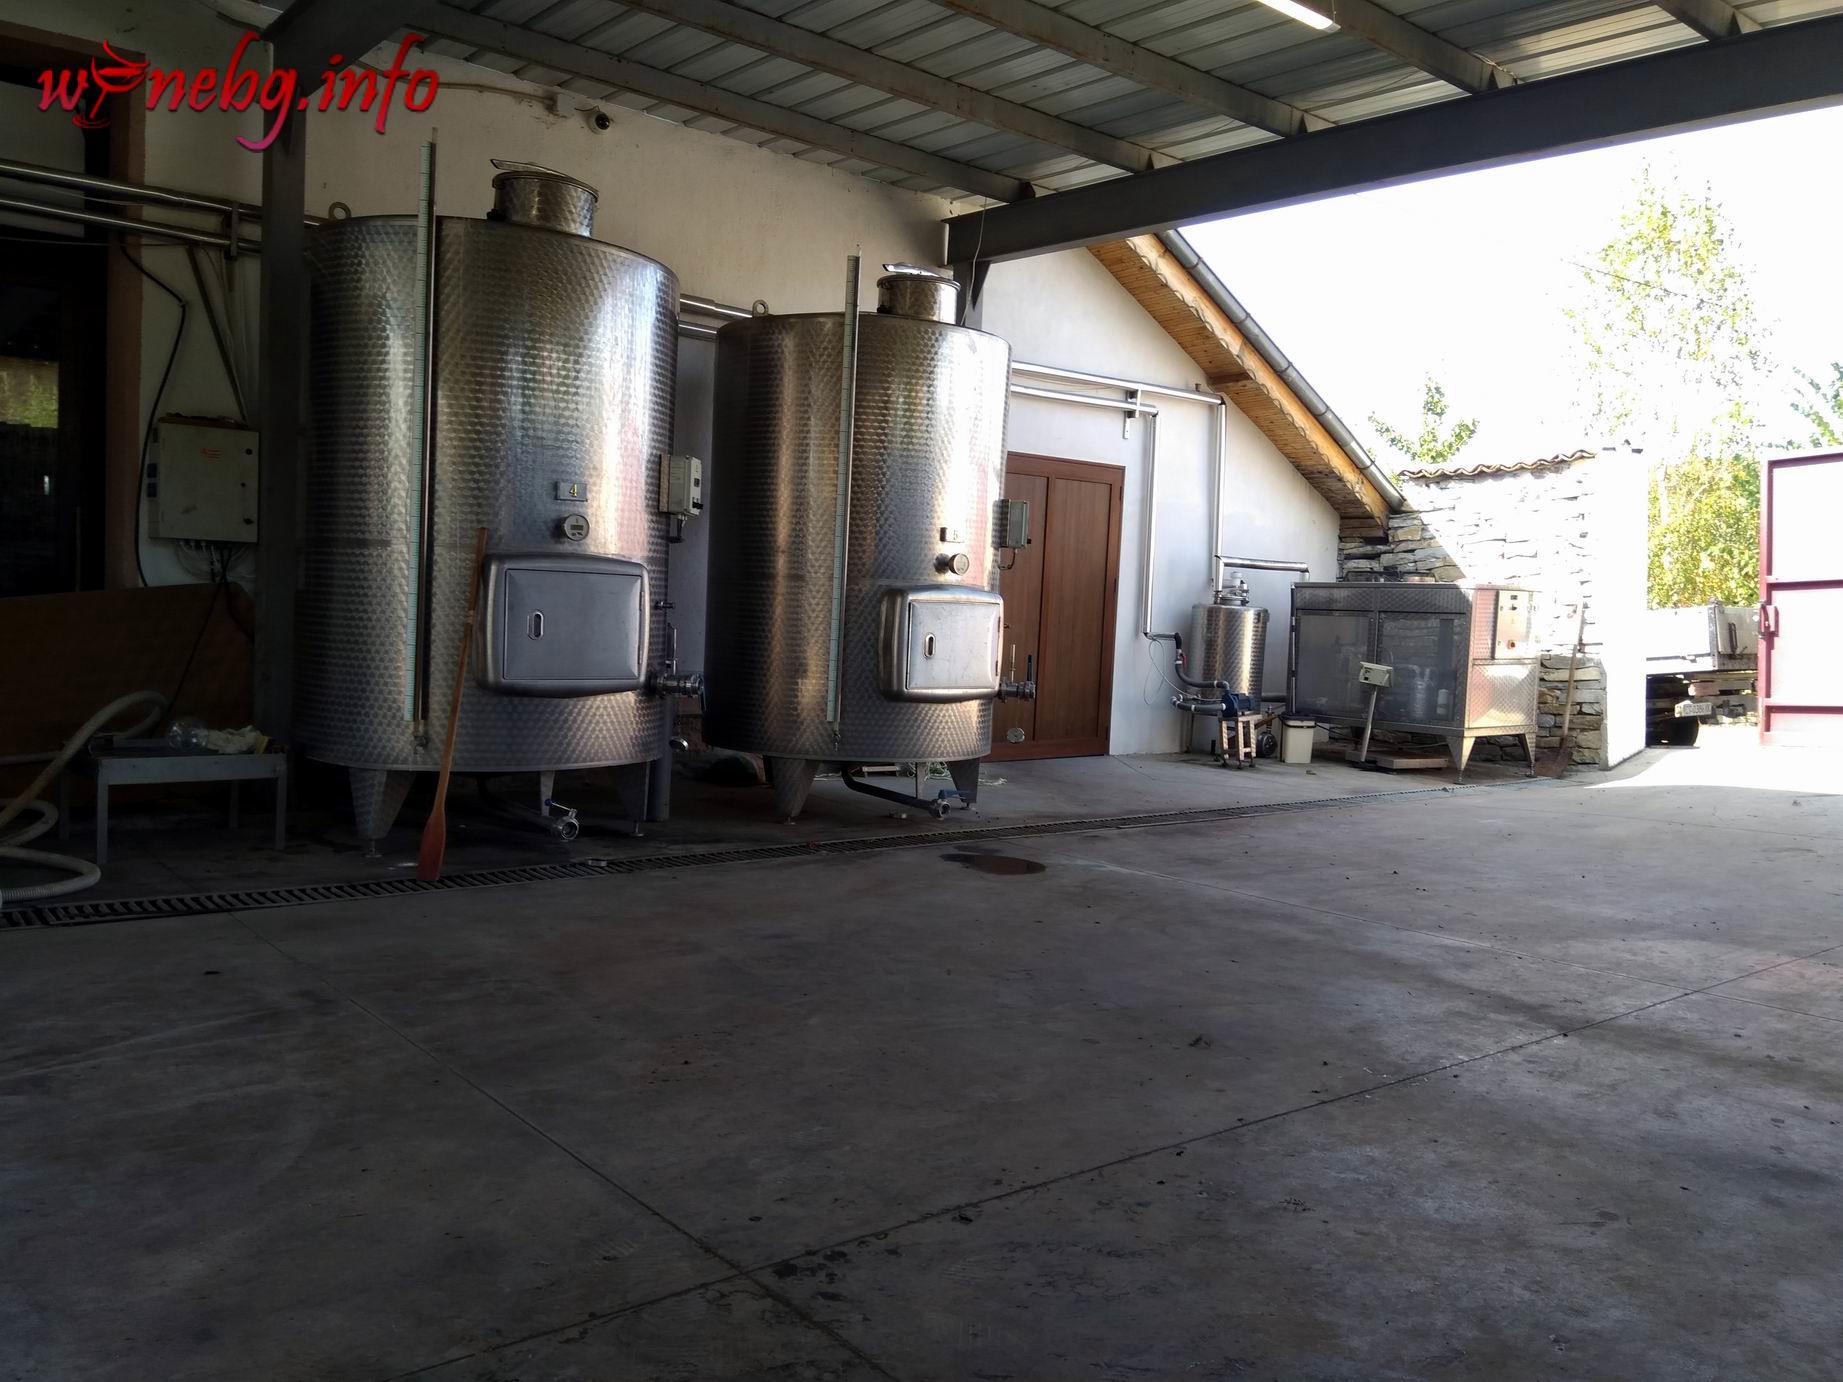 Roxs Winery - Winebg.info